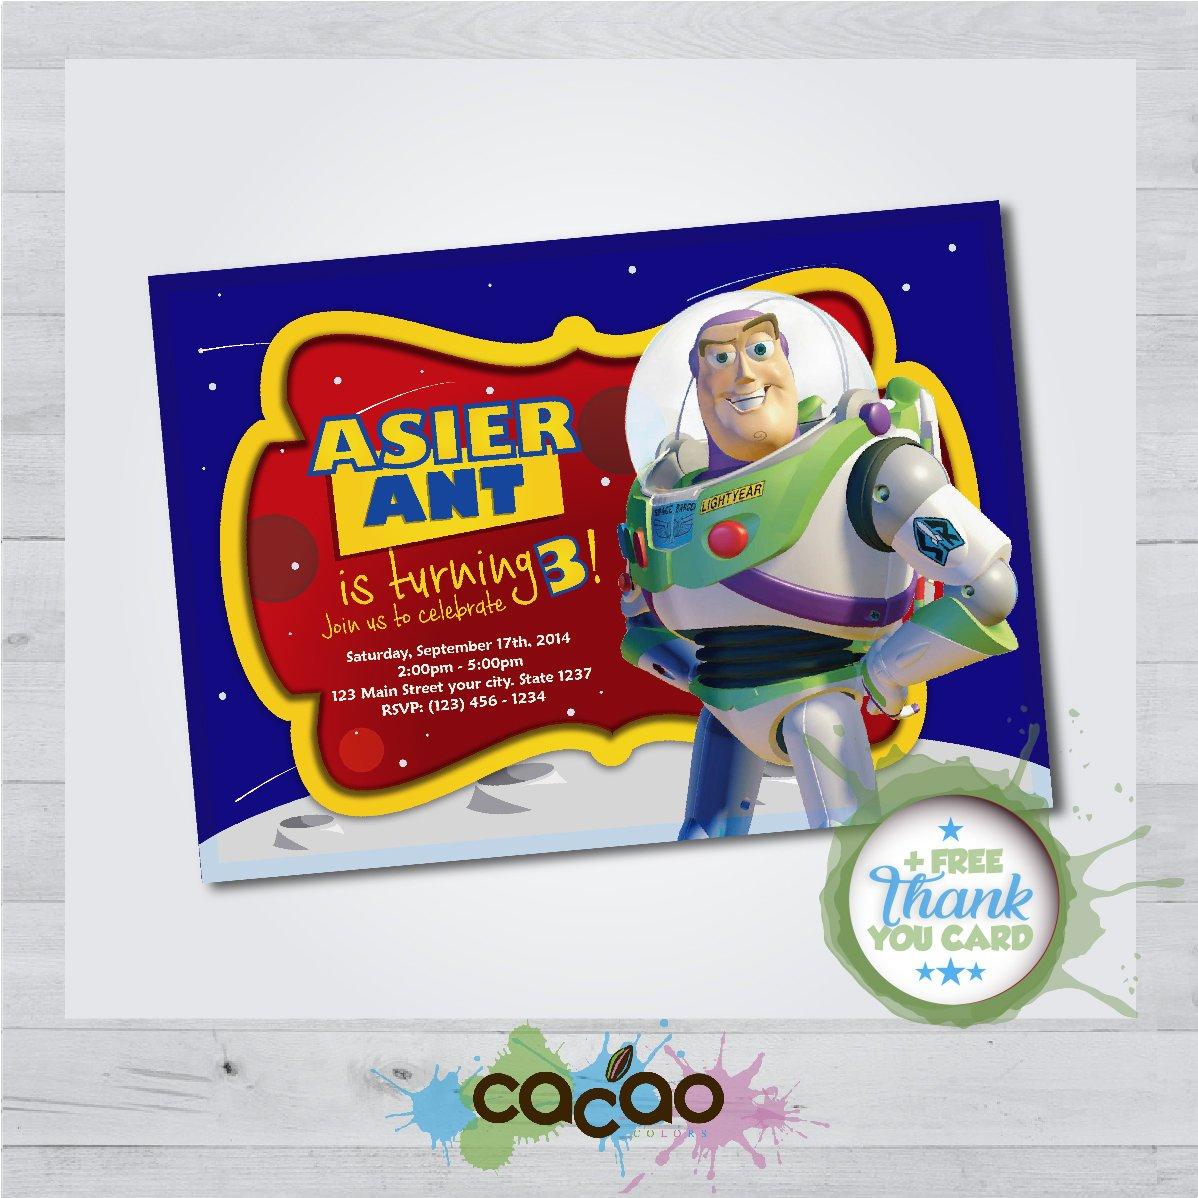 Toy Story Buzz Lightyear Invitation Toy Story Buzz Lightyear | Etsy - Toy Story Birthday Card Printable Free